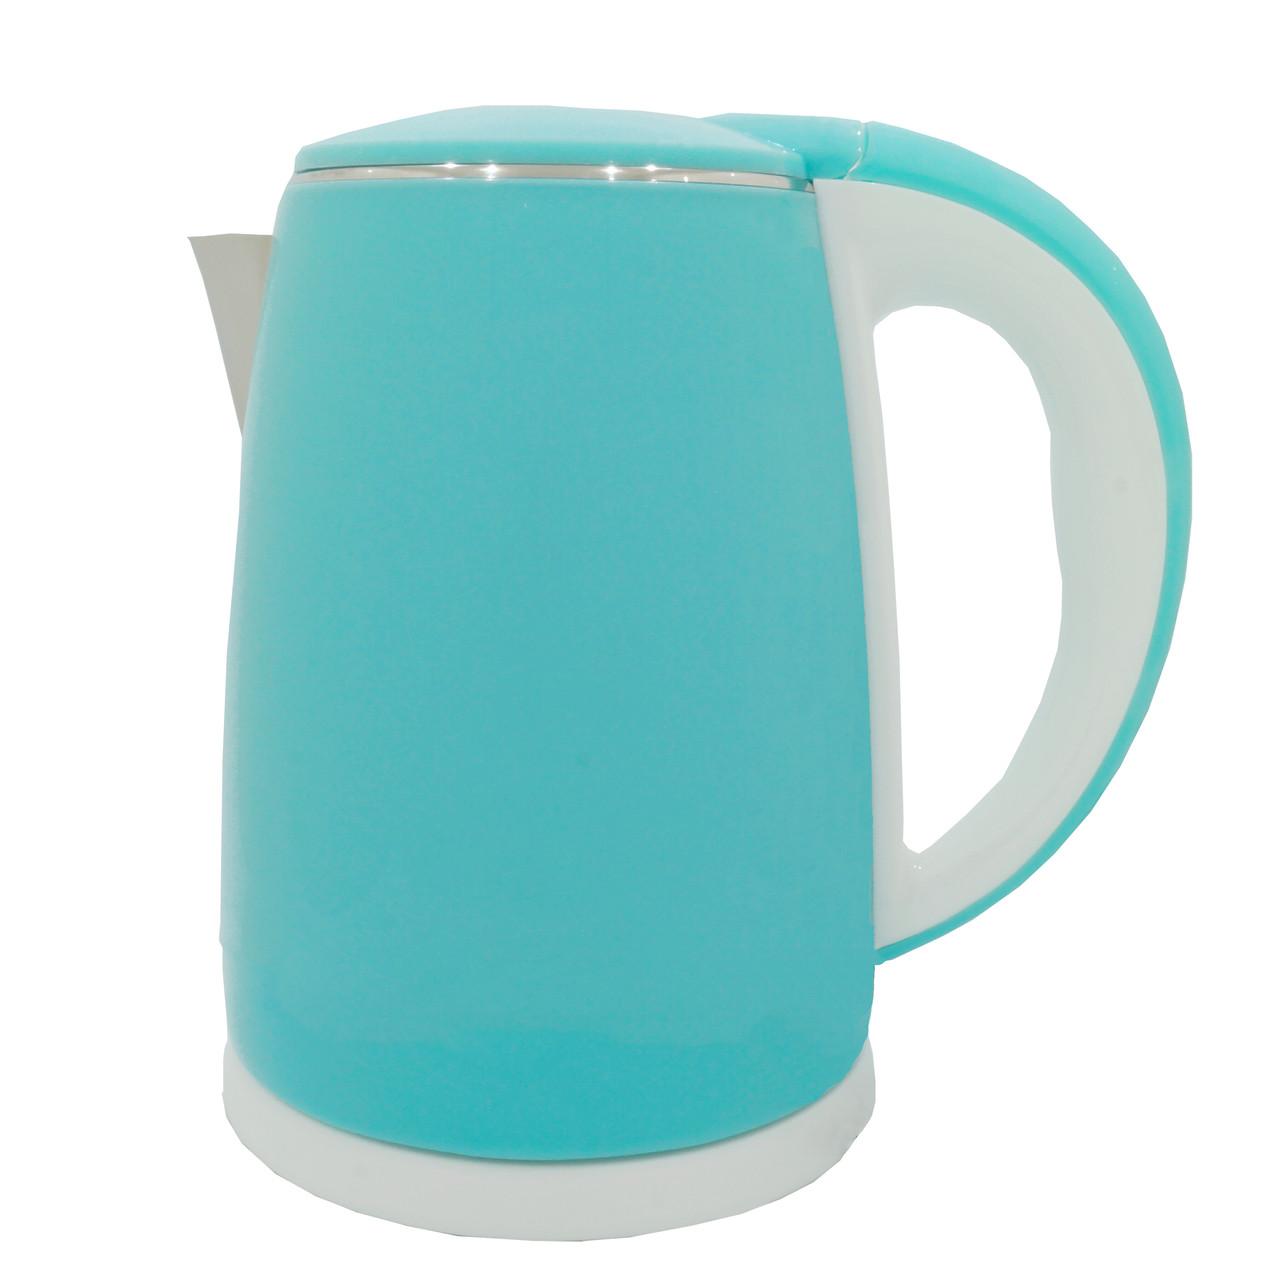 Электрочайник металл-пластик  DT 902 голубой 2 литра распродажа